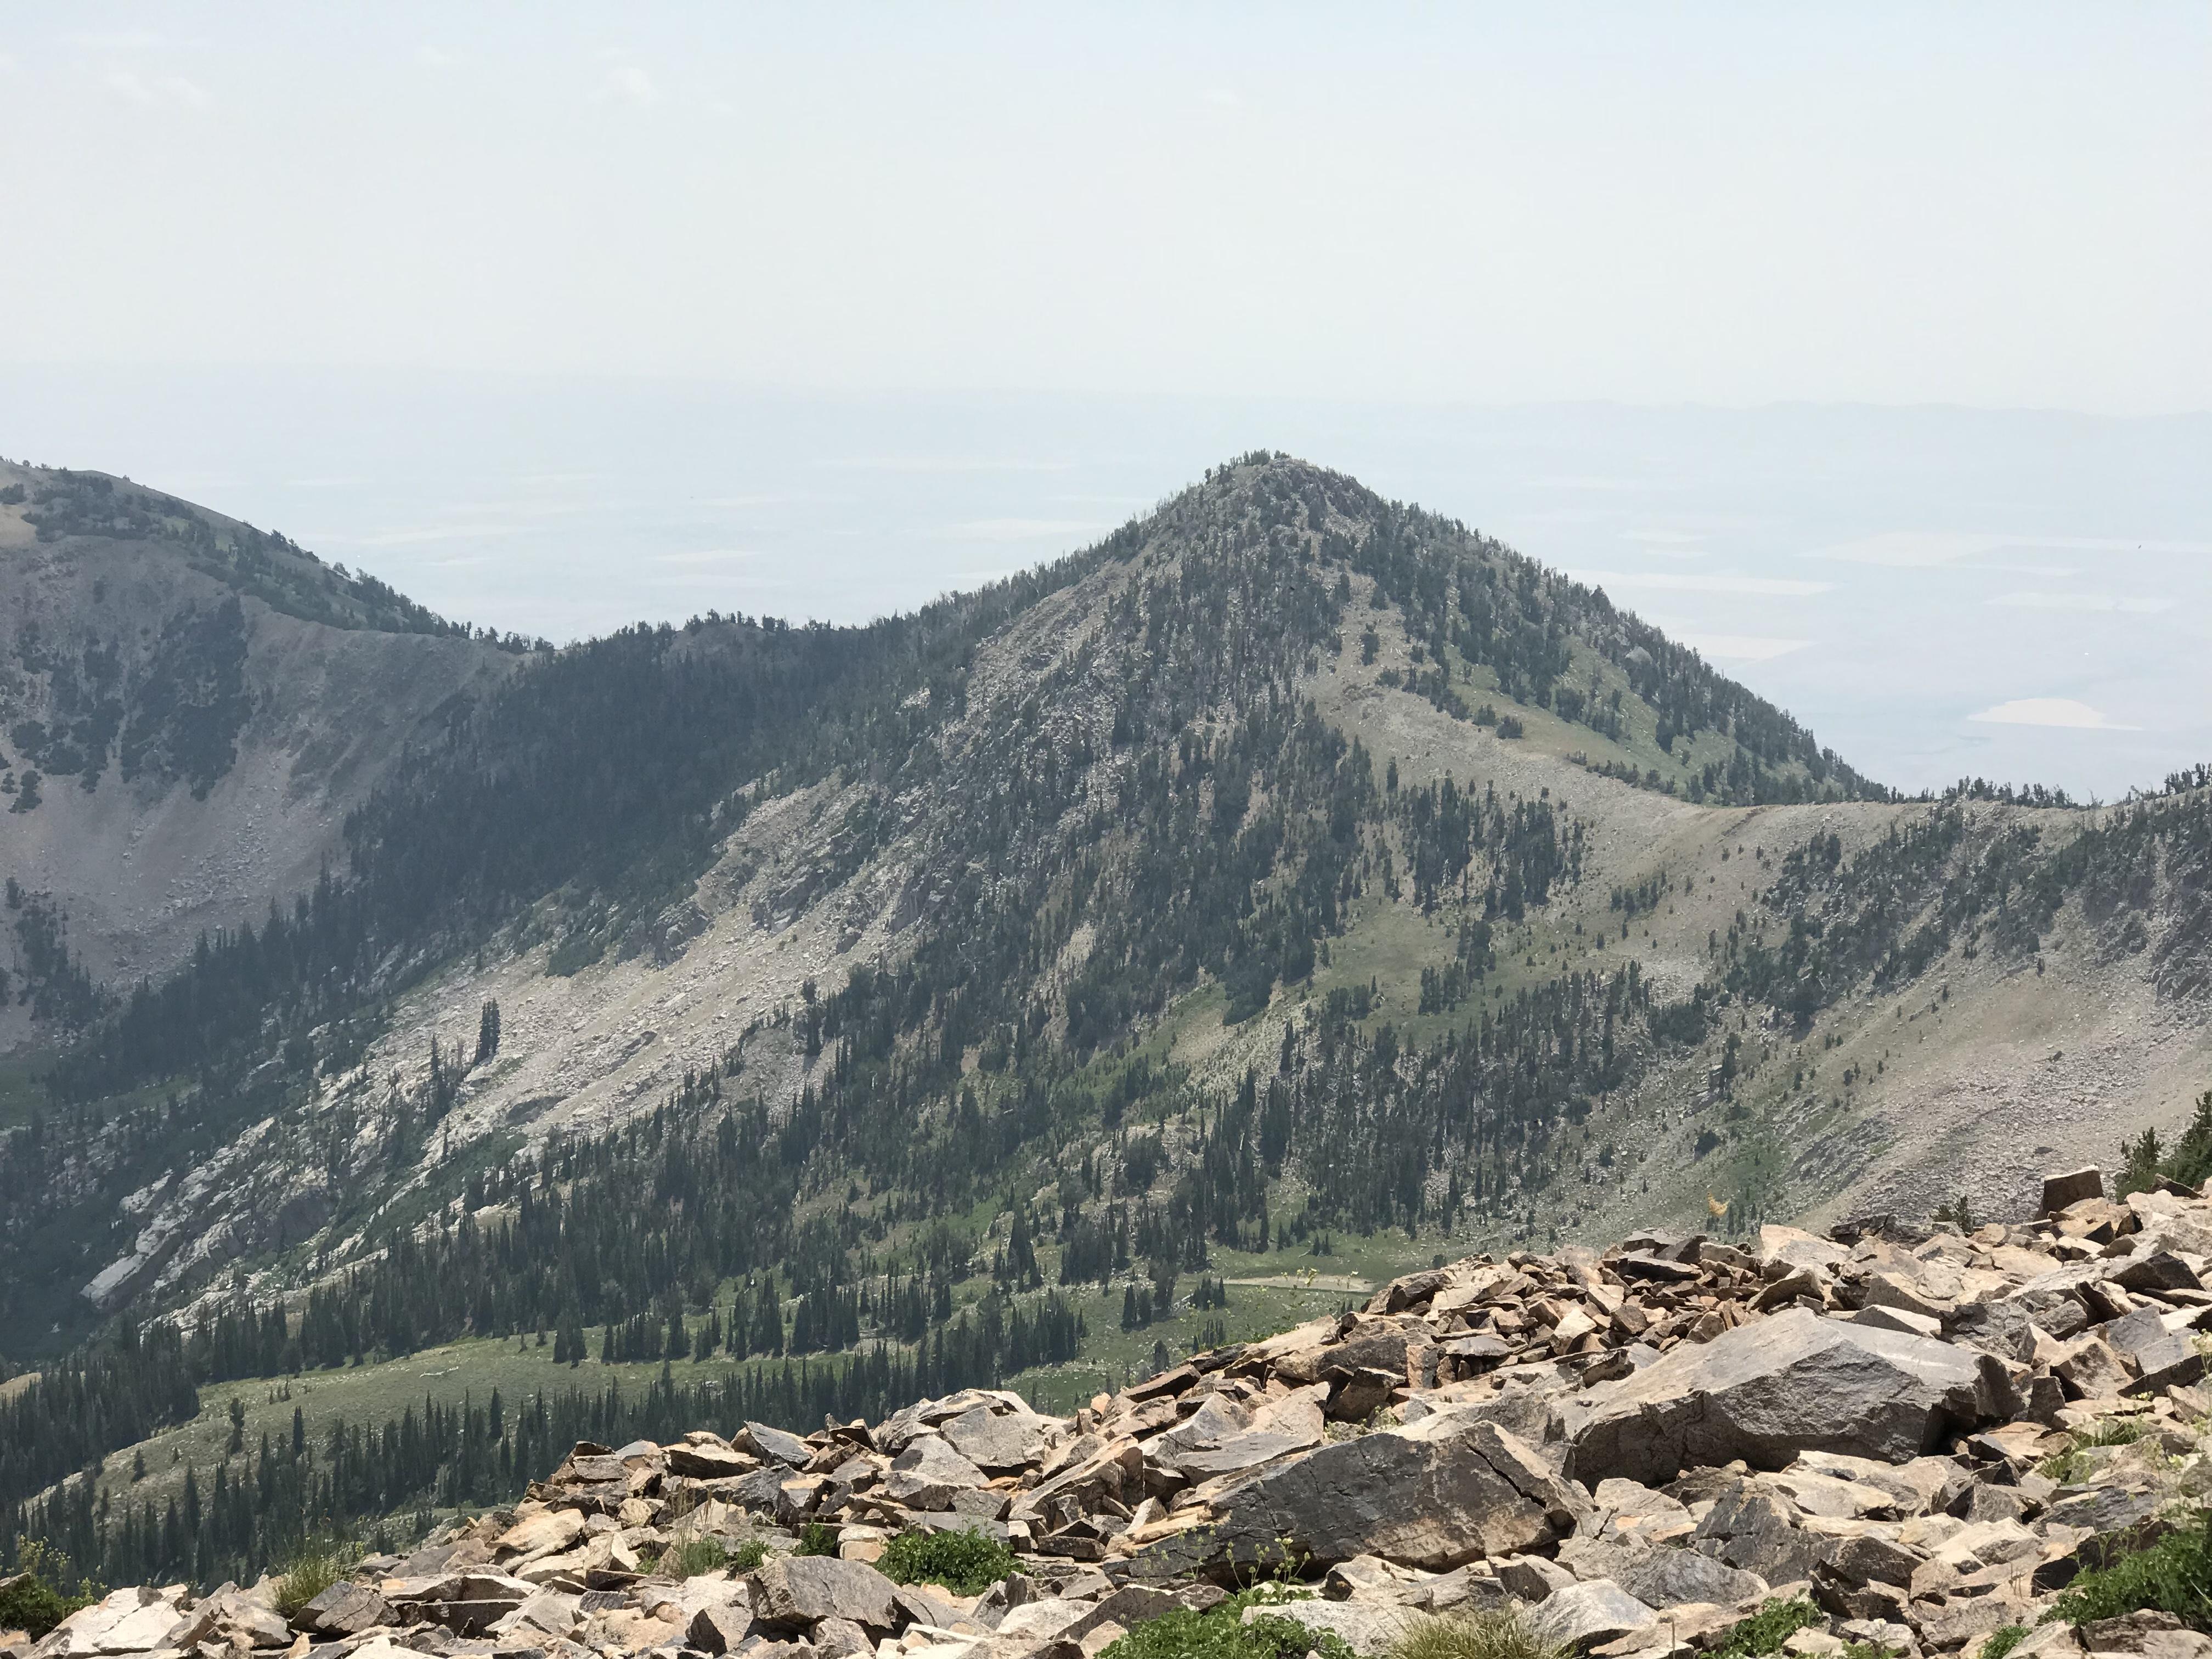 Third Peak viewed from the north ridge of North Smoky Dome.